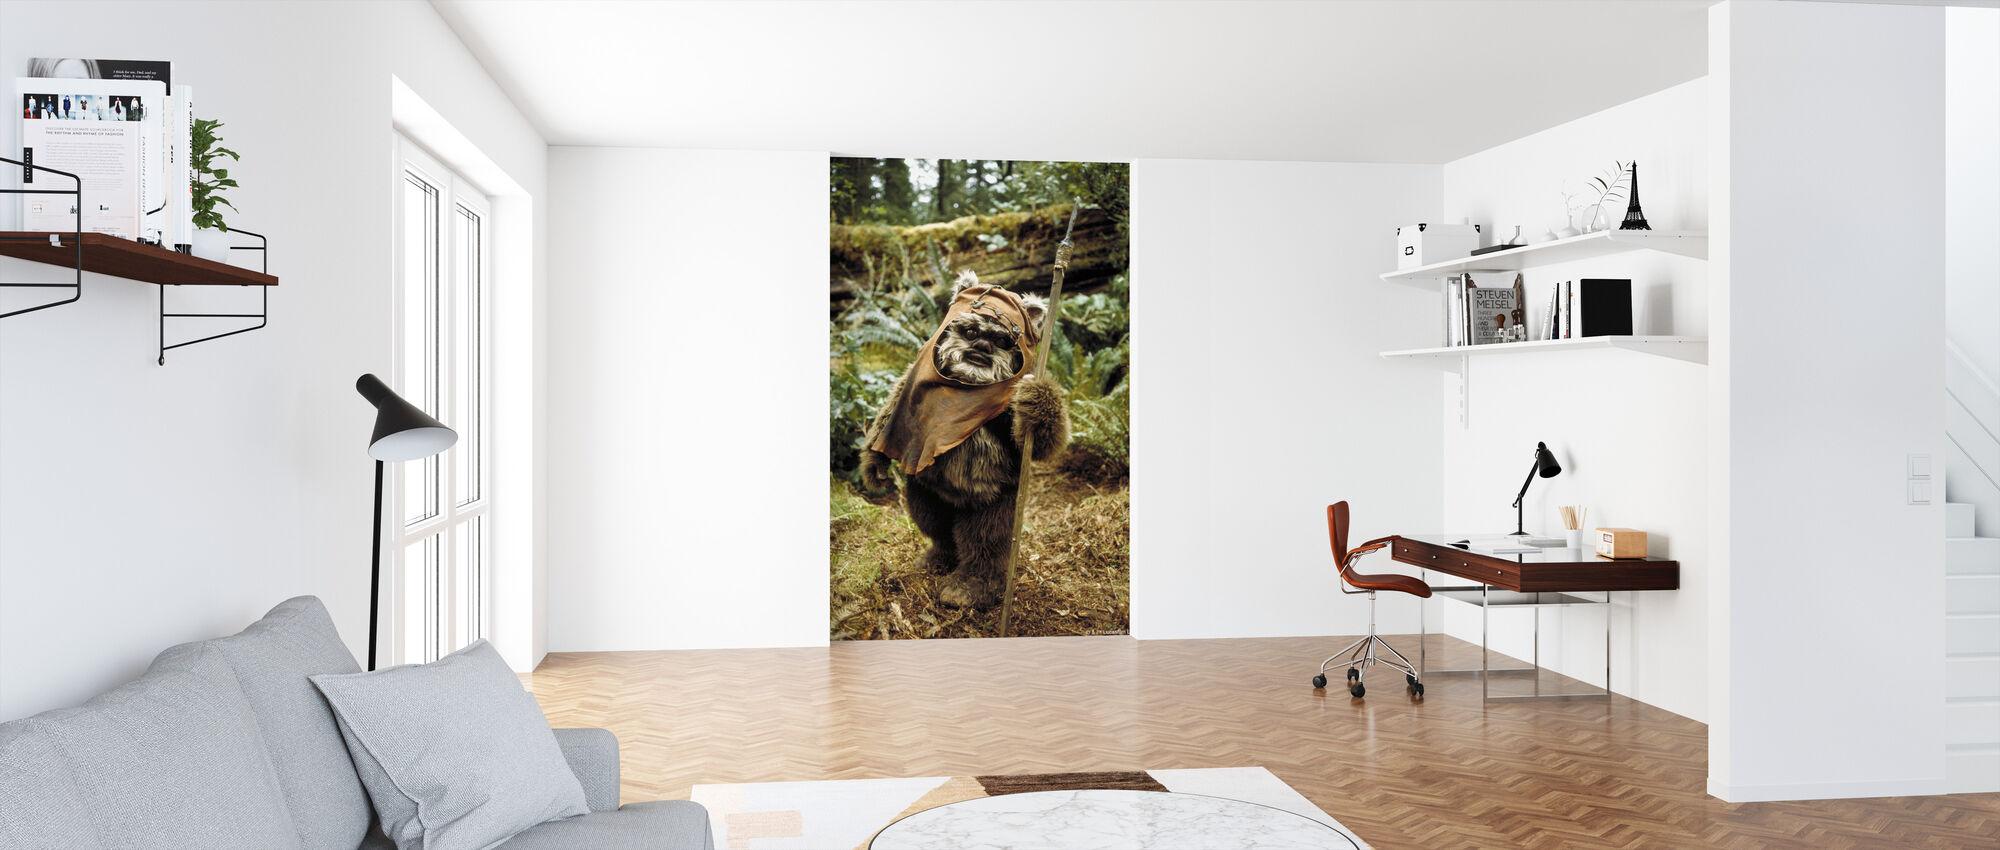 Star Wars - Ewok wicket - Tapet - Kontor